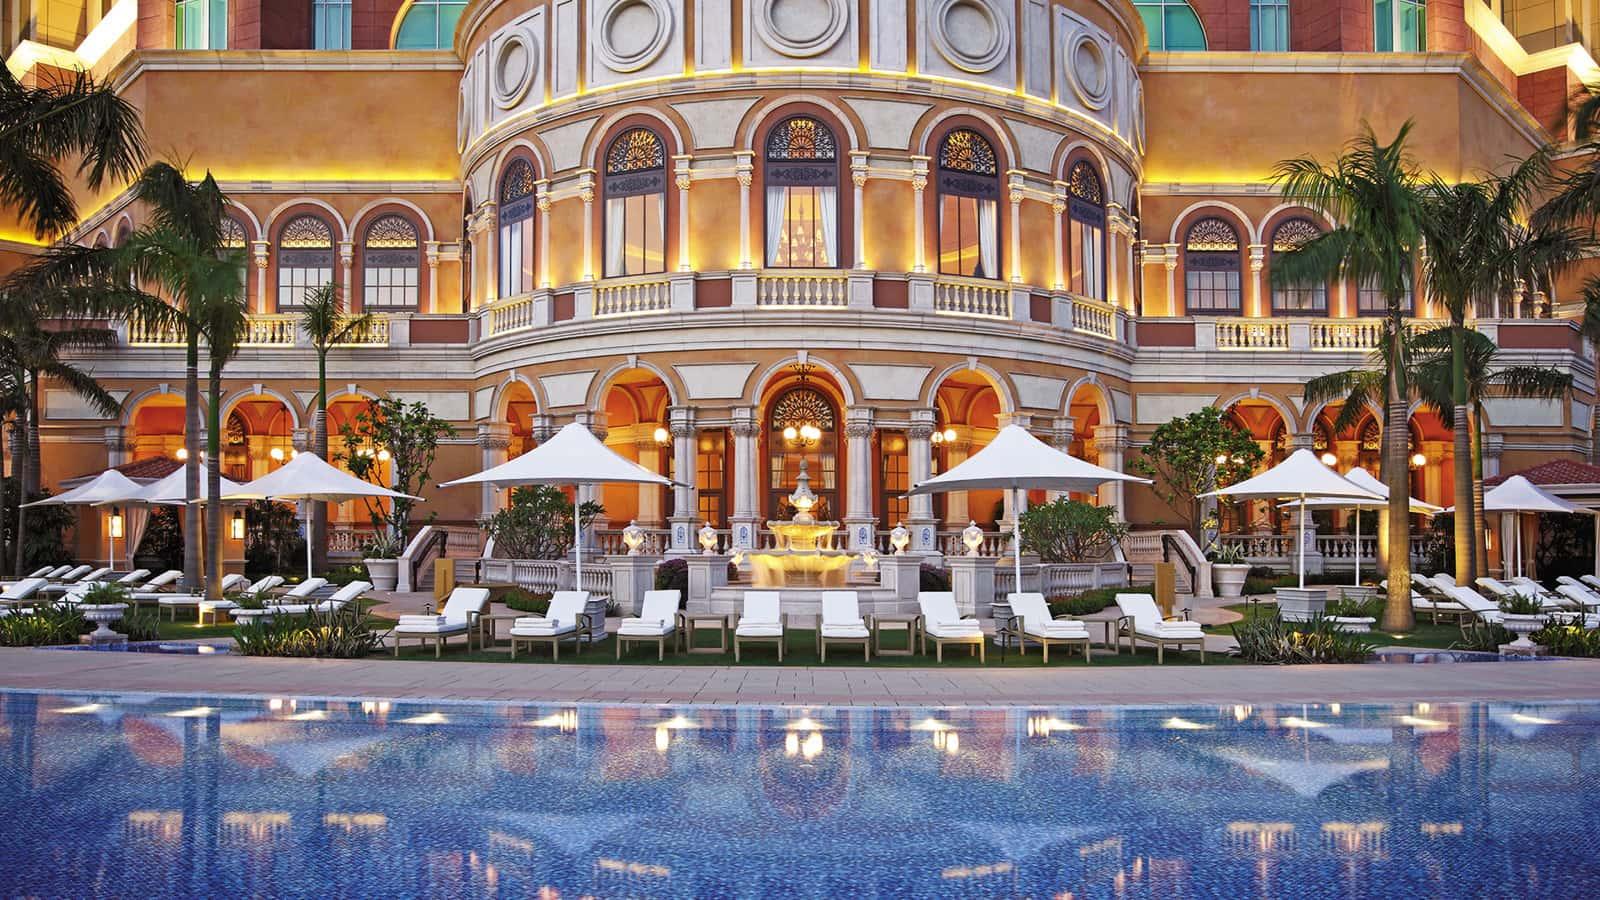 Pool for wedding